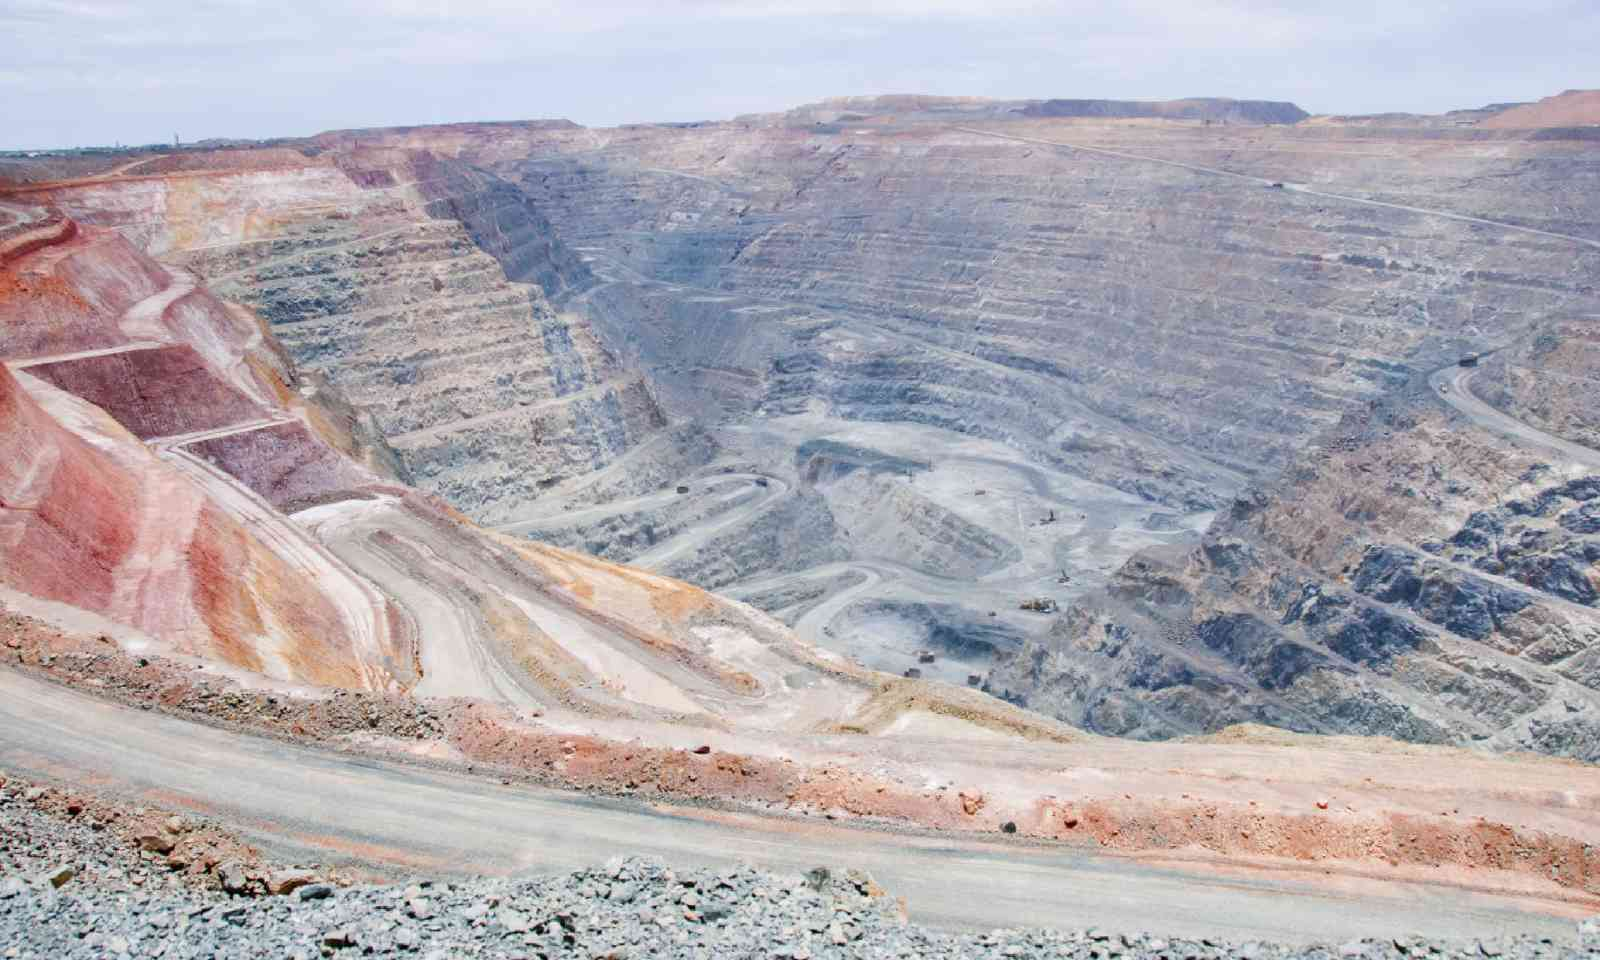 Kalgoorlie, Western Australia (Shutterstock)